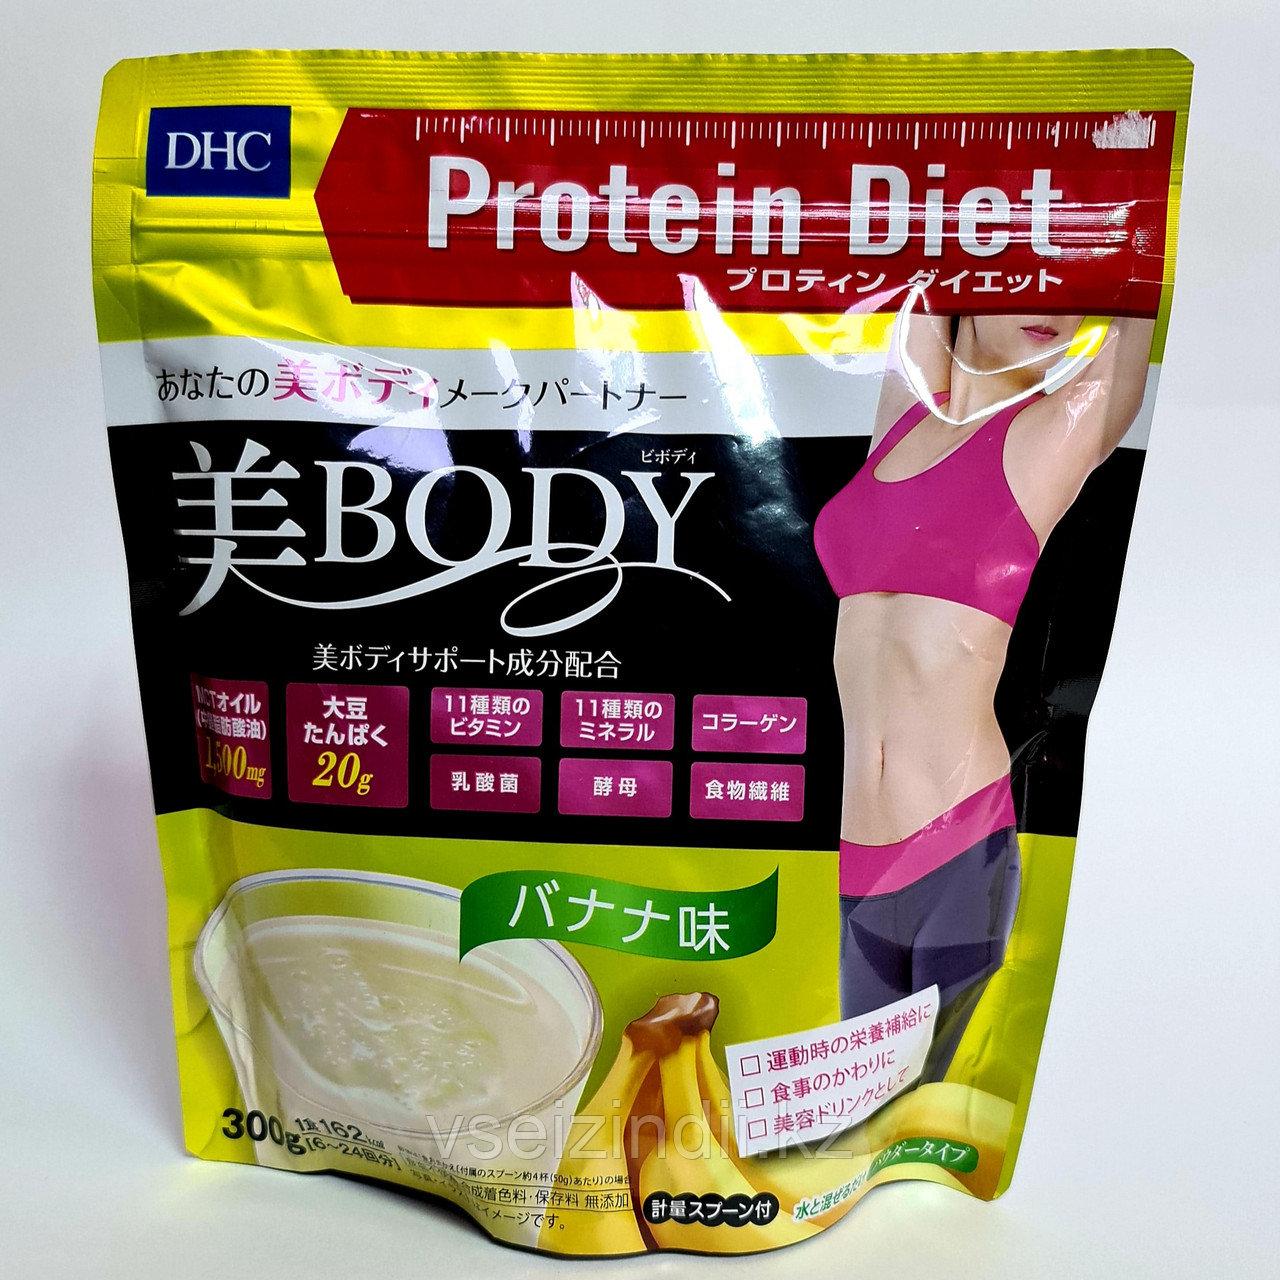 Диетический протеиновый коктейль Protein Diet Beauty Body, DHC со вкусом банана. 300 гр